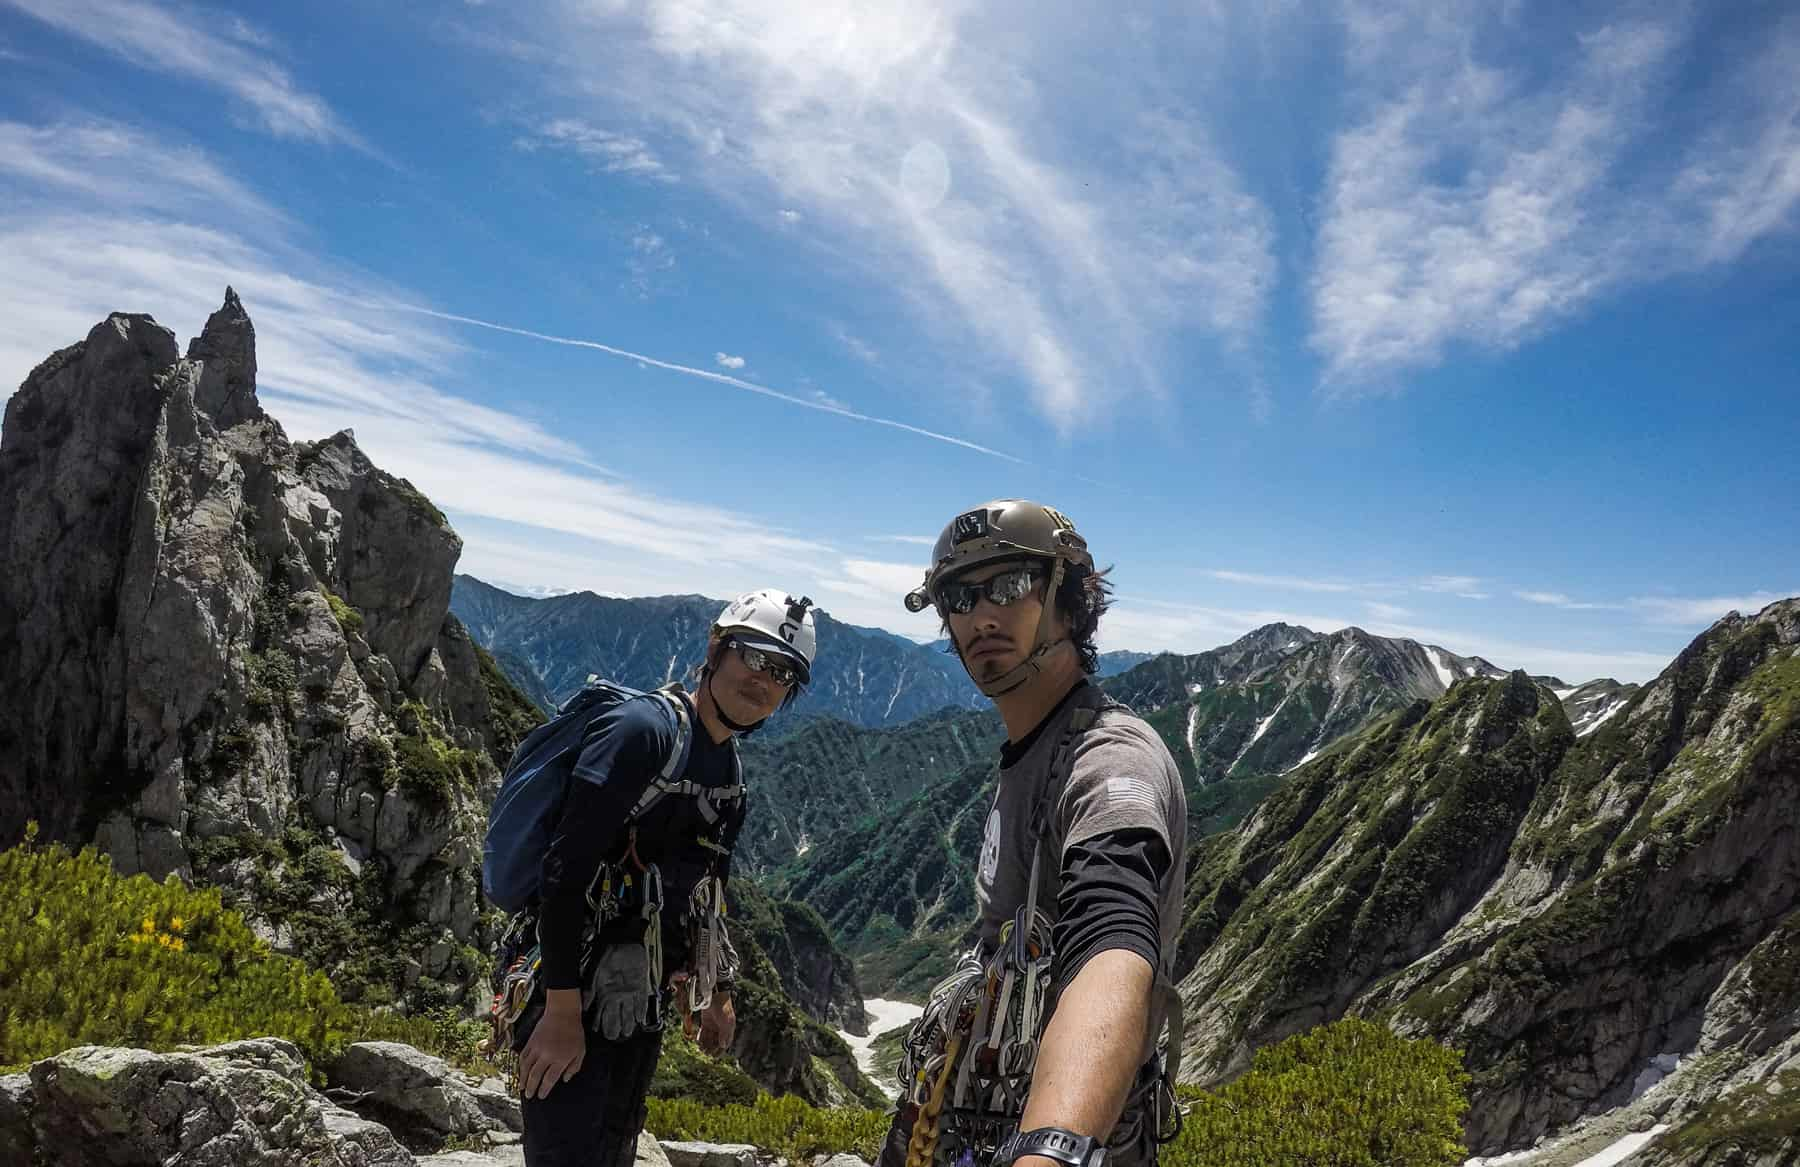 Field Report: Mount Tsurugi GOPR3407